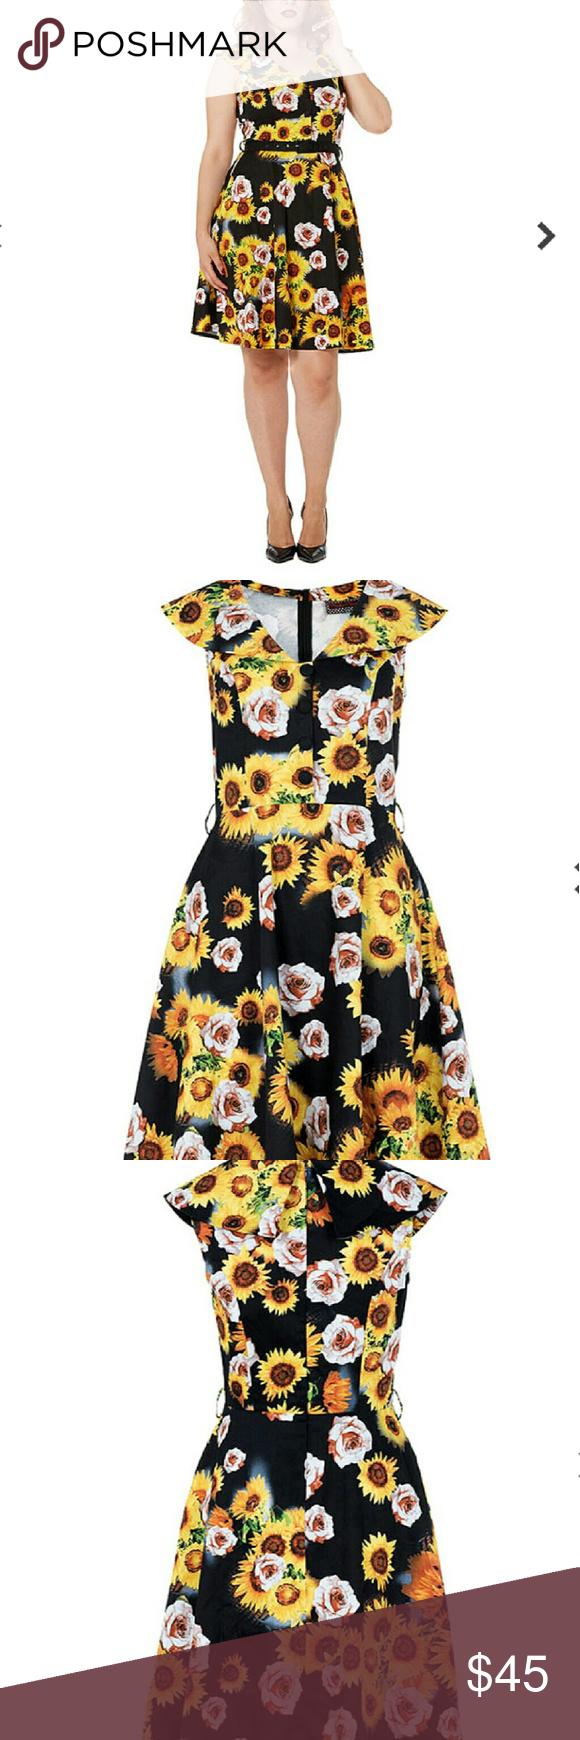 b0e86a1aa8ee Voodoo Vixen Sunflower dress NWT, sleeveless with sunflowers ModCloth  Dresses